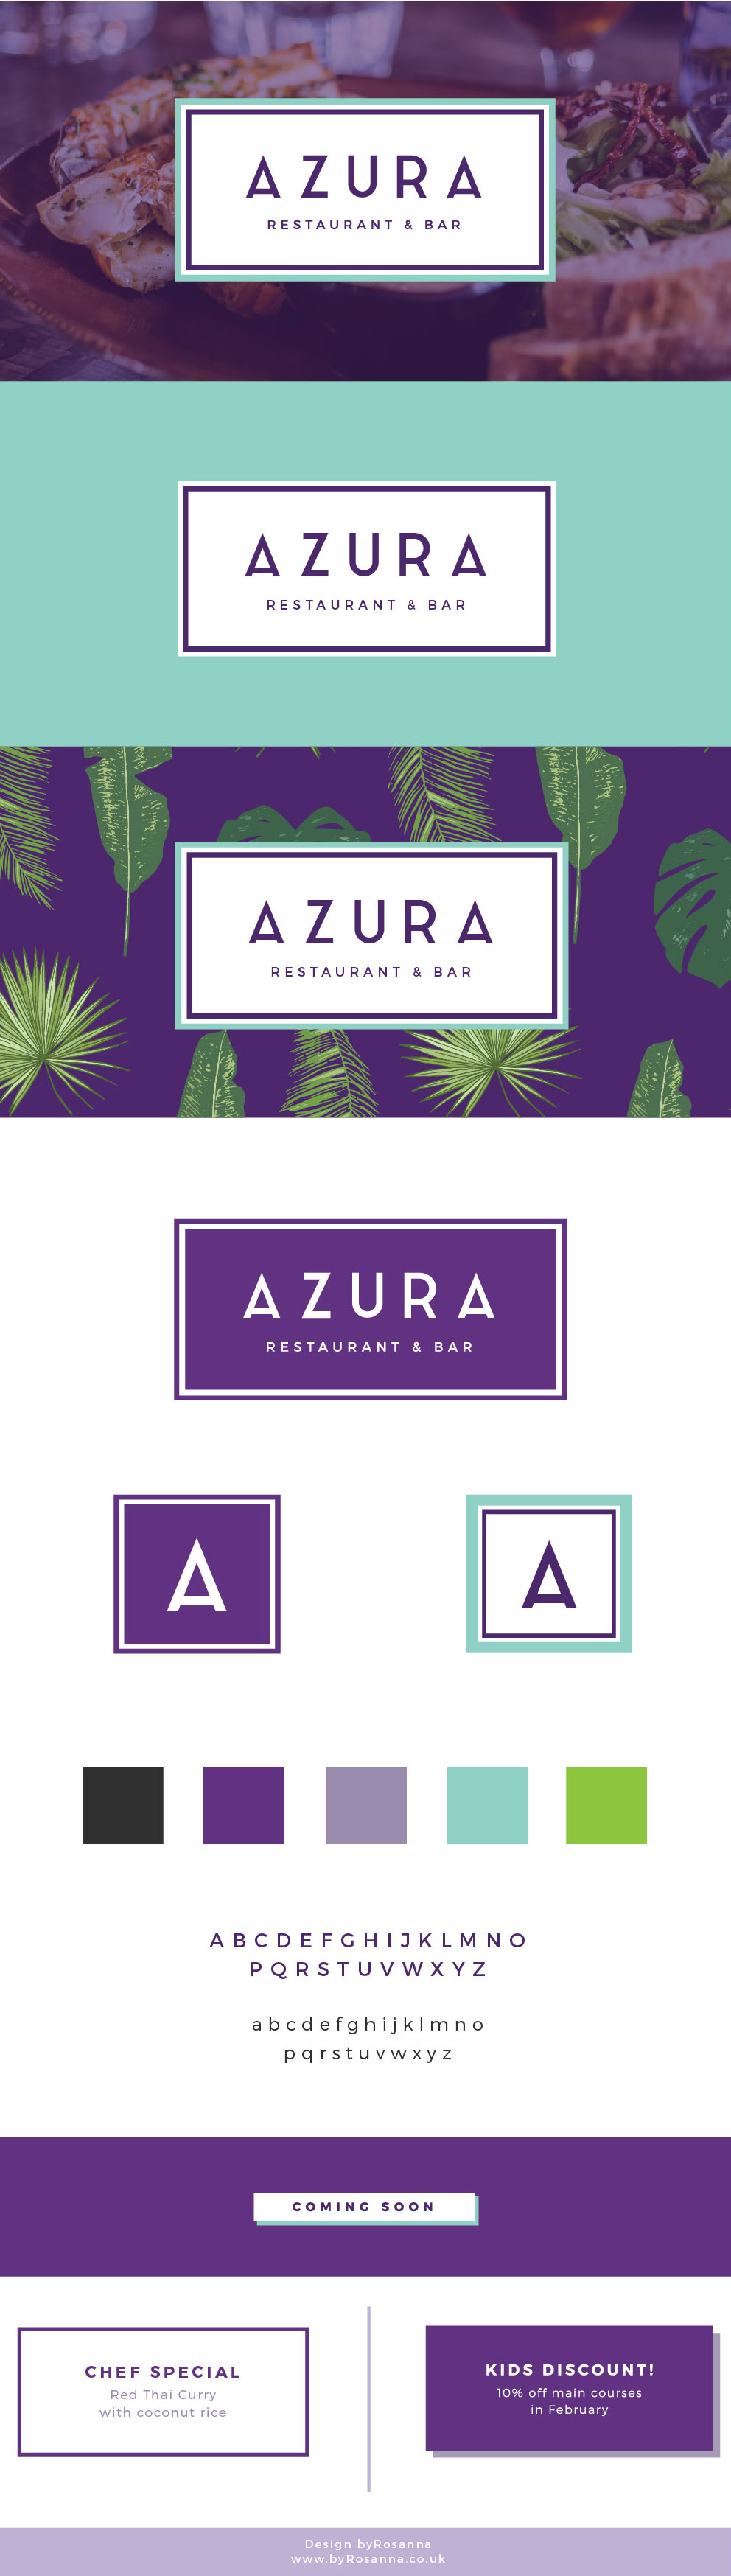 Brand Design for Azura Restaurant & Bar | byRosanna